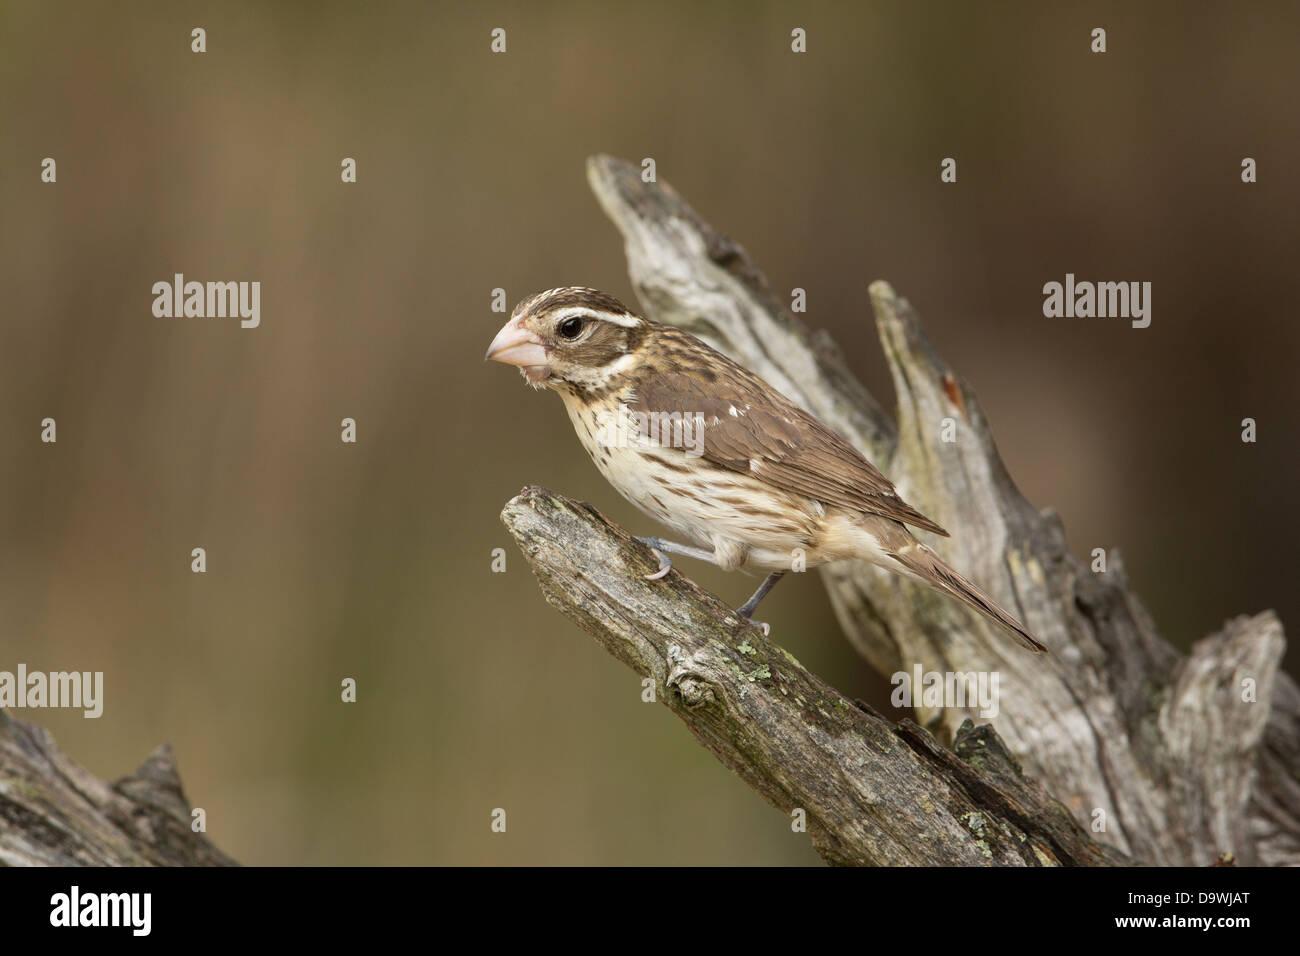 Female rose-breasted grosbeak - Stock Image